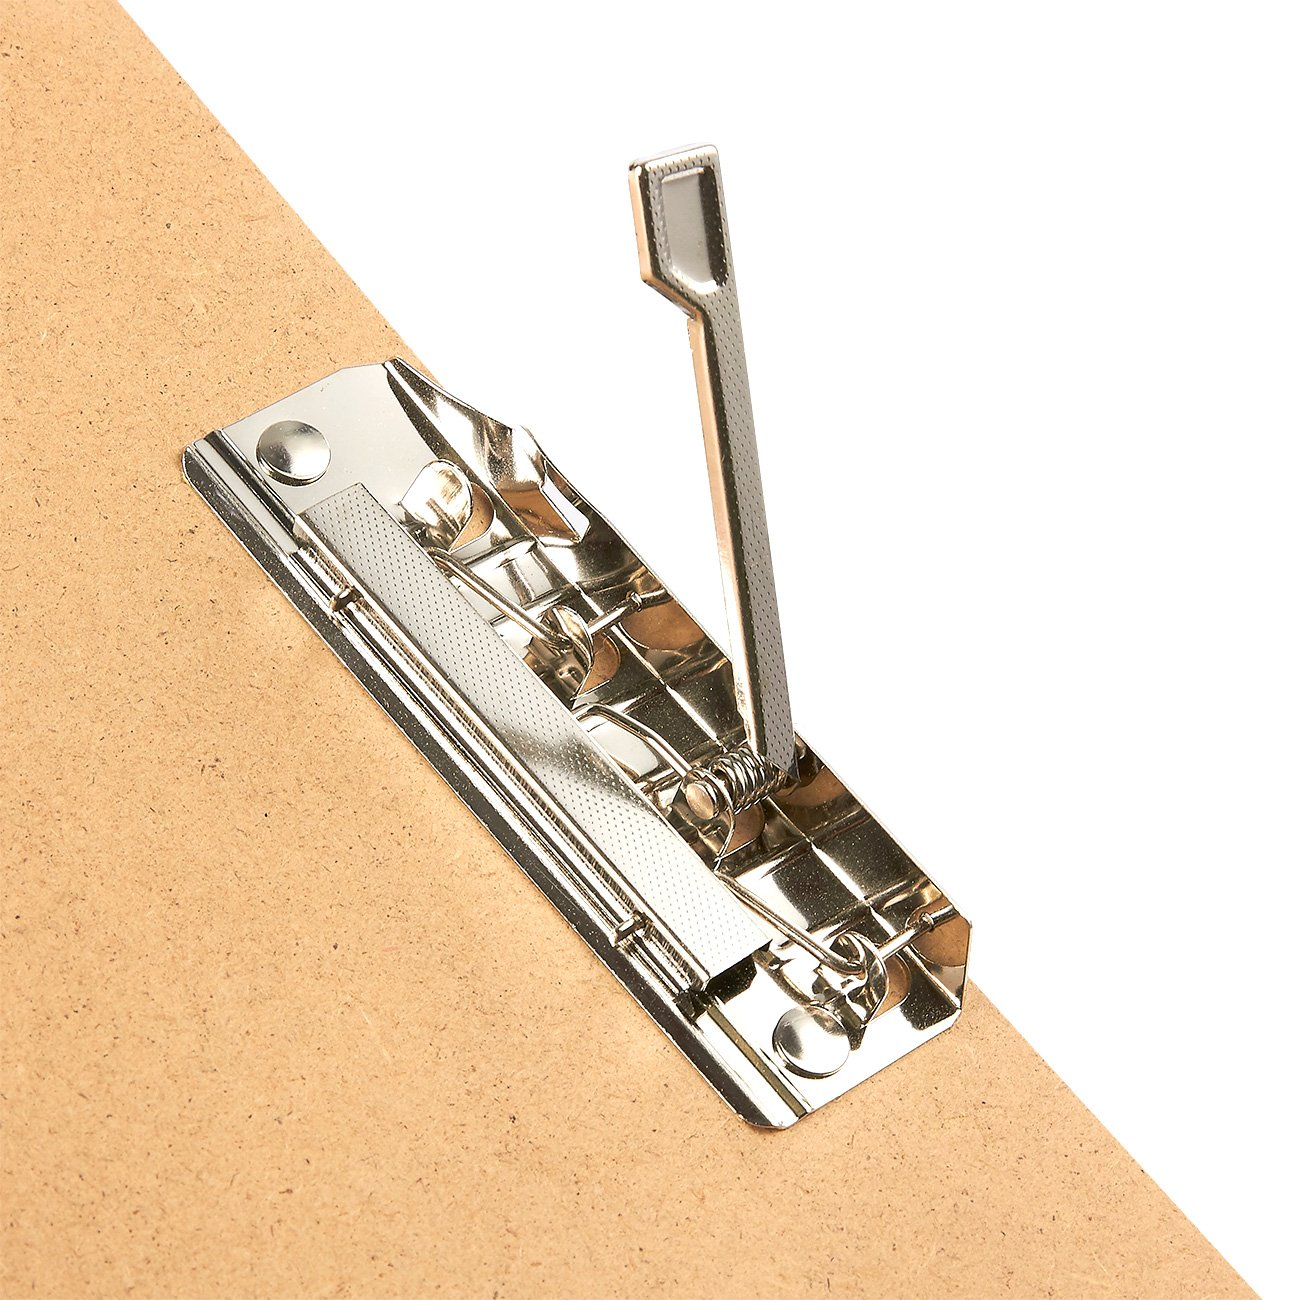 1200 rpm Osborn 77283SP NovoFlex Honing Tool 3.75 Item Diameter 3.5 Hole Diameter 0.25 Shank Diameter Silicon Carbide